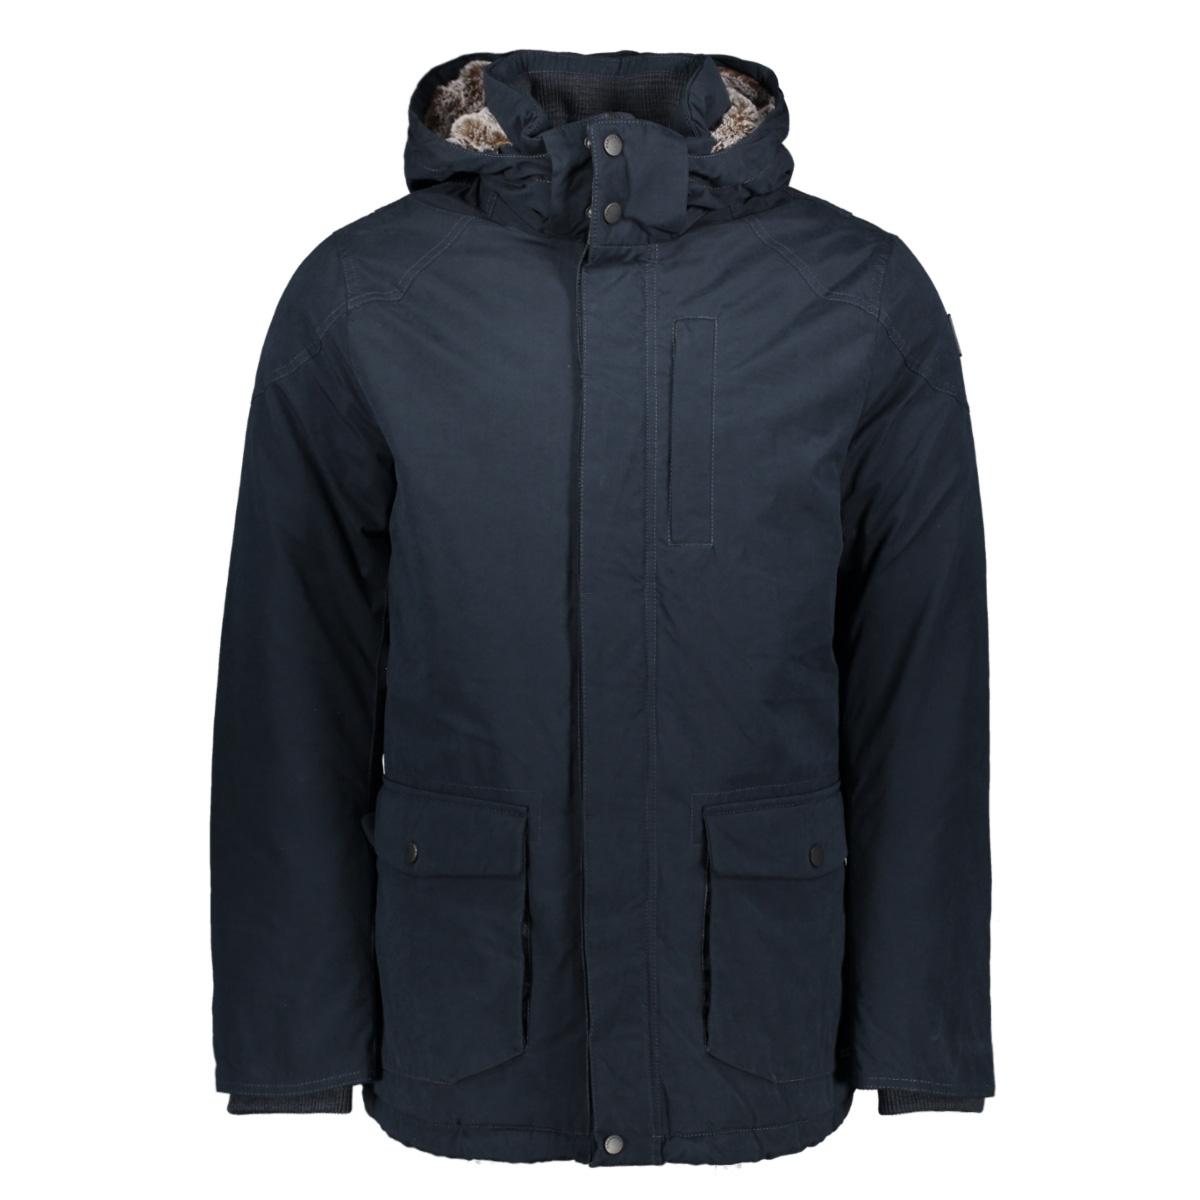 clearlake cruiser jacket vja196313 vanguard jas 5281